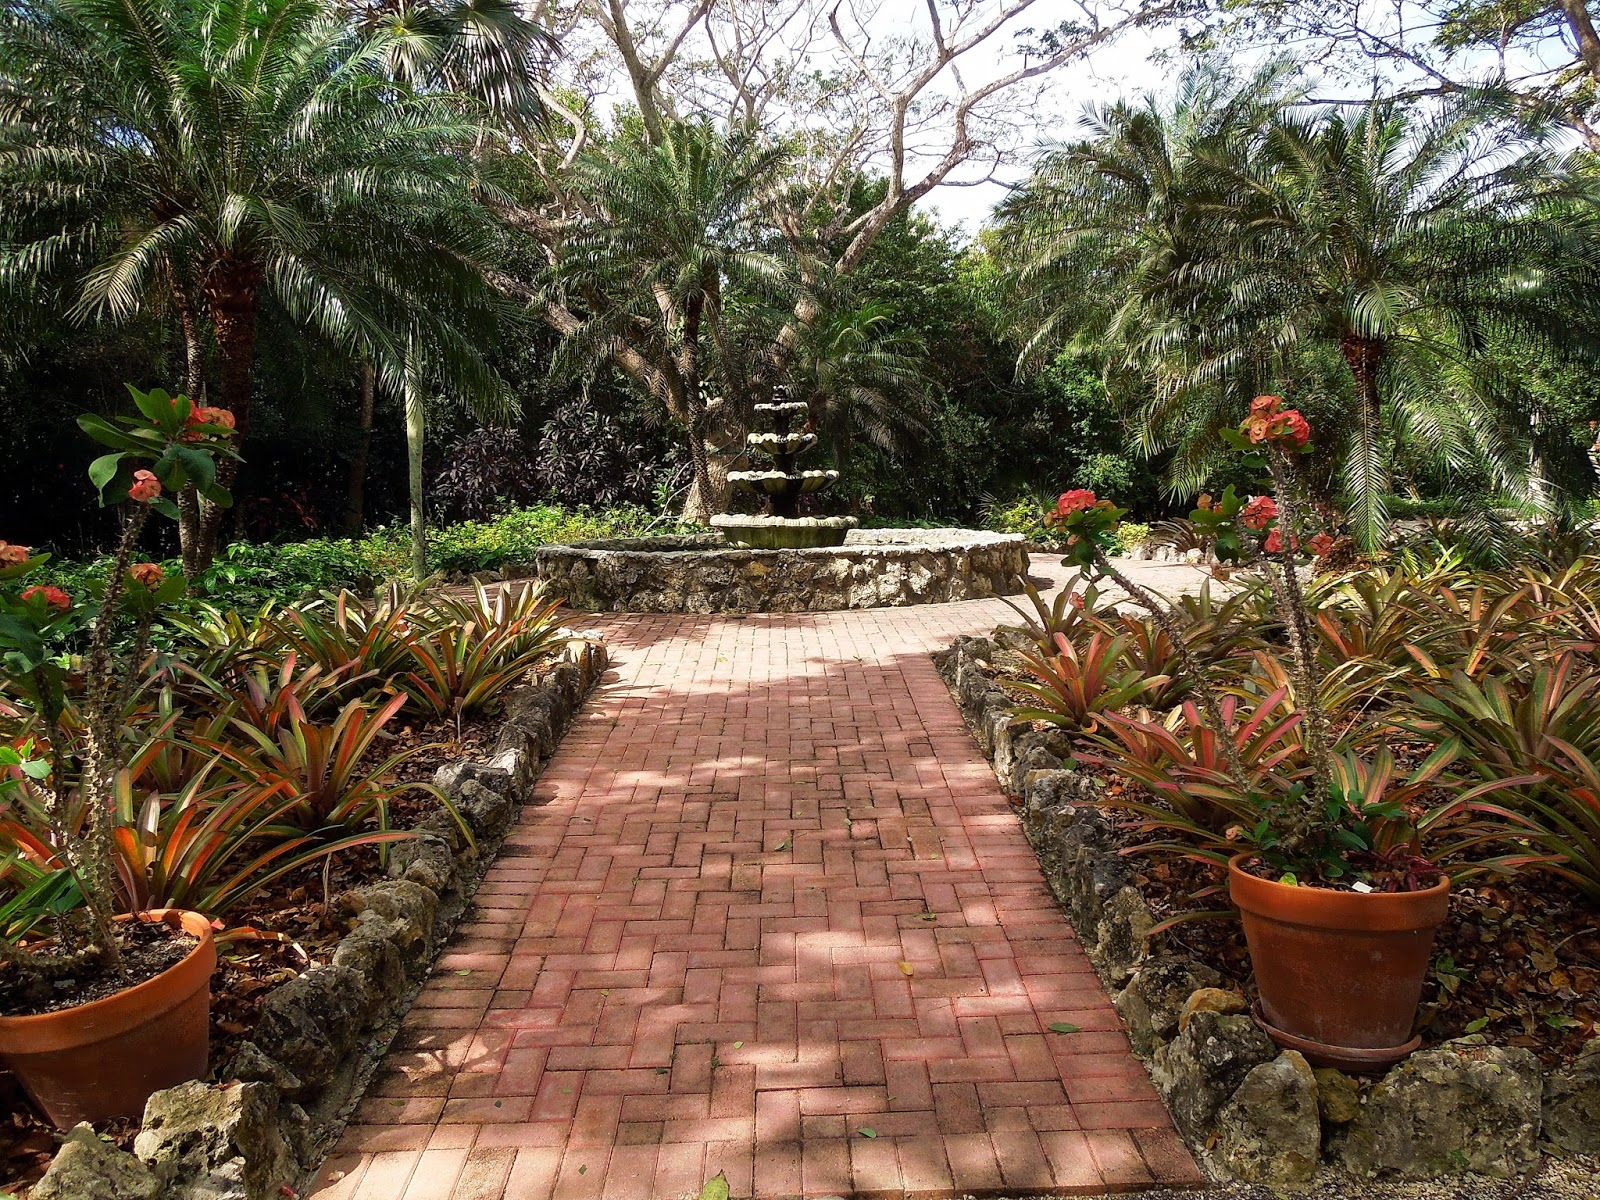 Focusing On Travel : A Natural Choice - Queen Elizabeth II Botanic Park